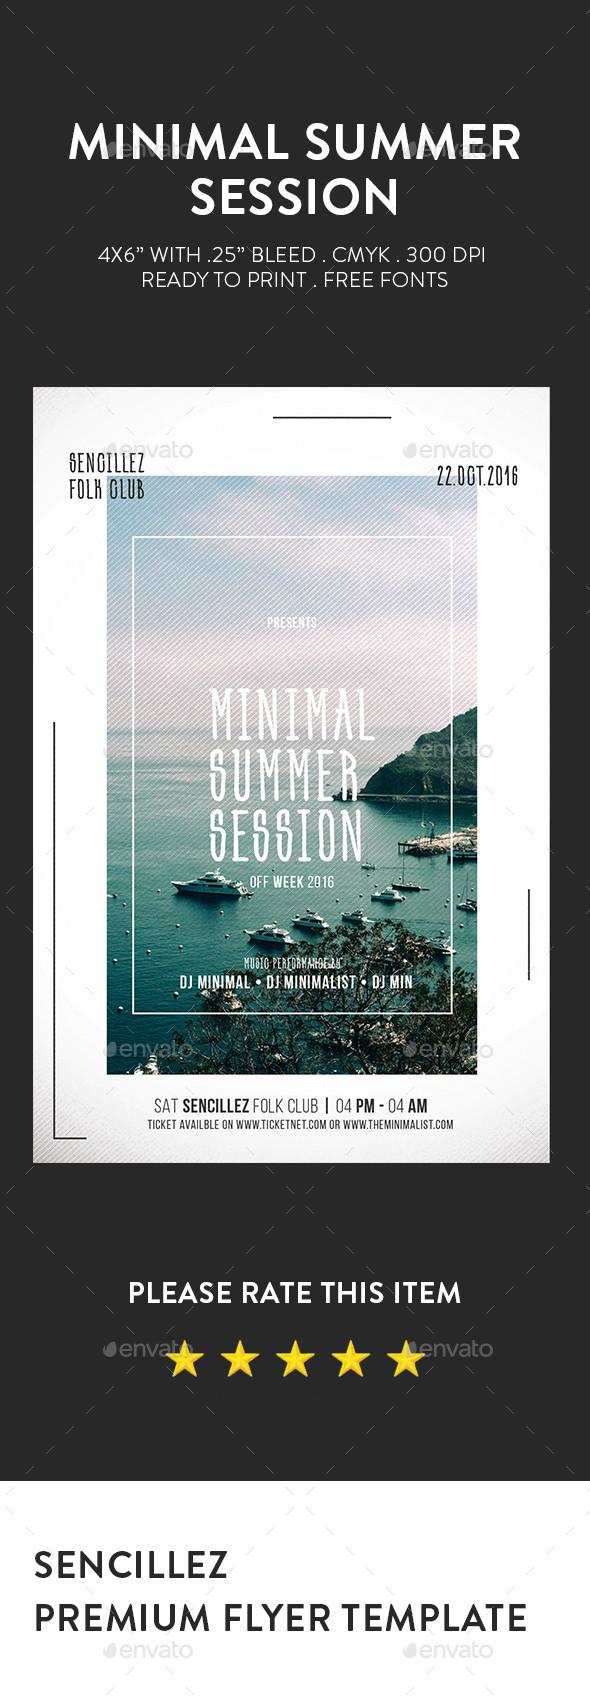 Minimal Summer Session Flyer